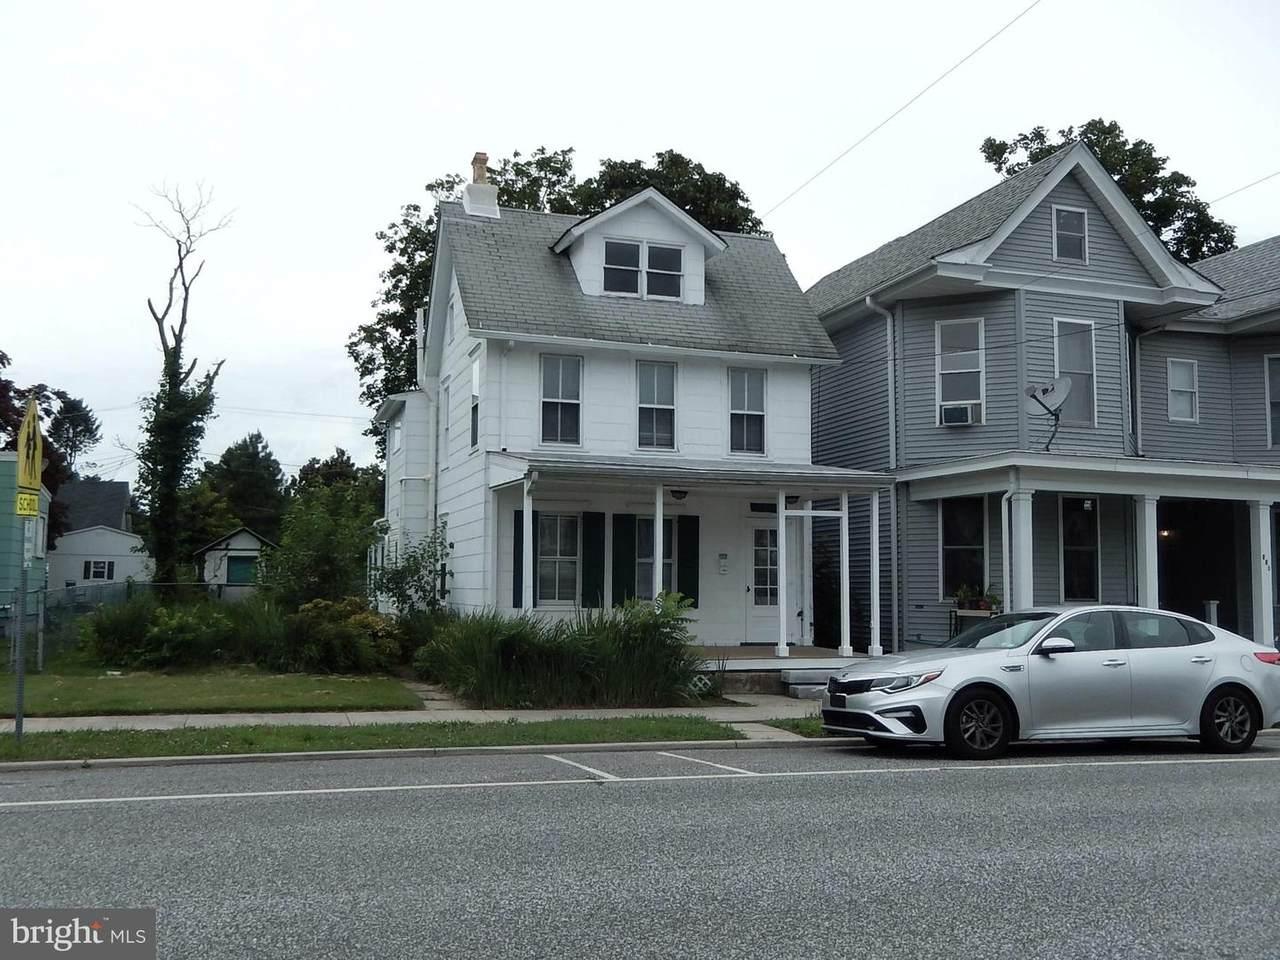 433 Main Street - Photo 1